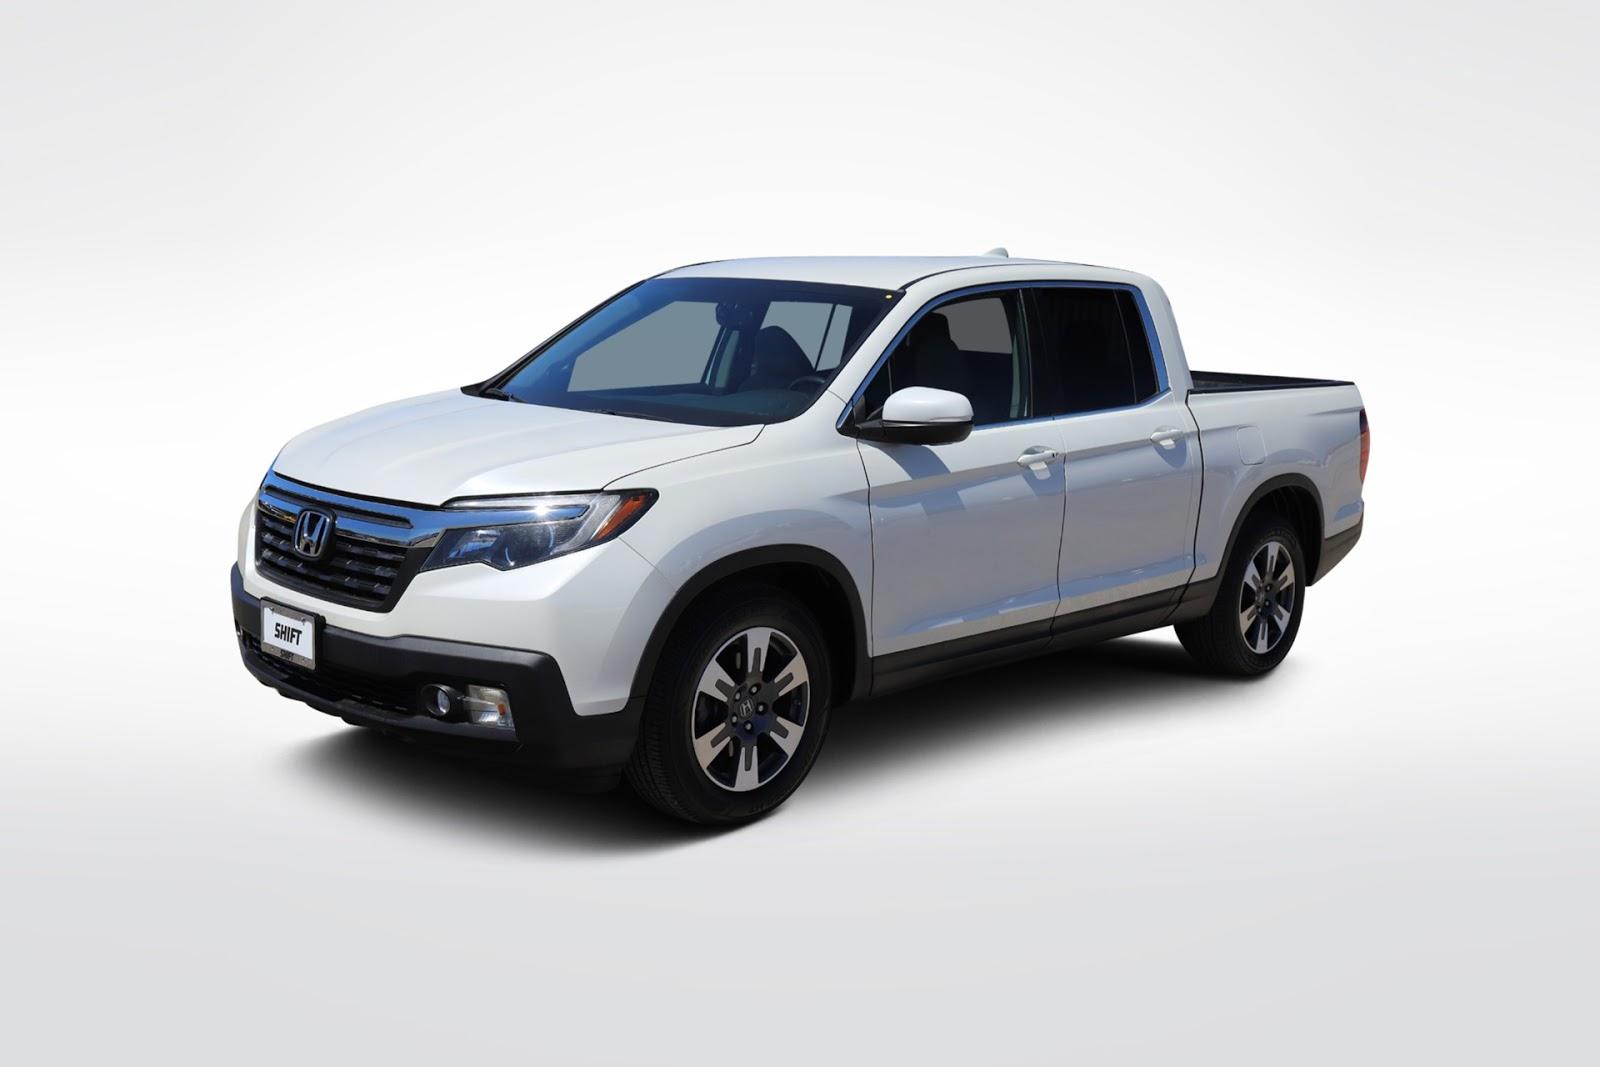 2017 Honda Ridgeline RTL-T (from $27,700)